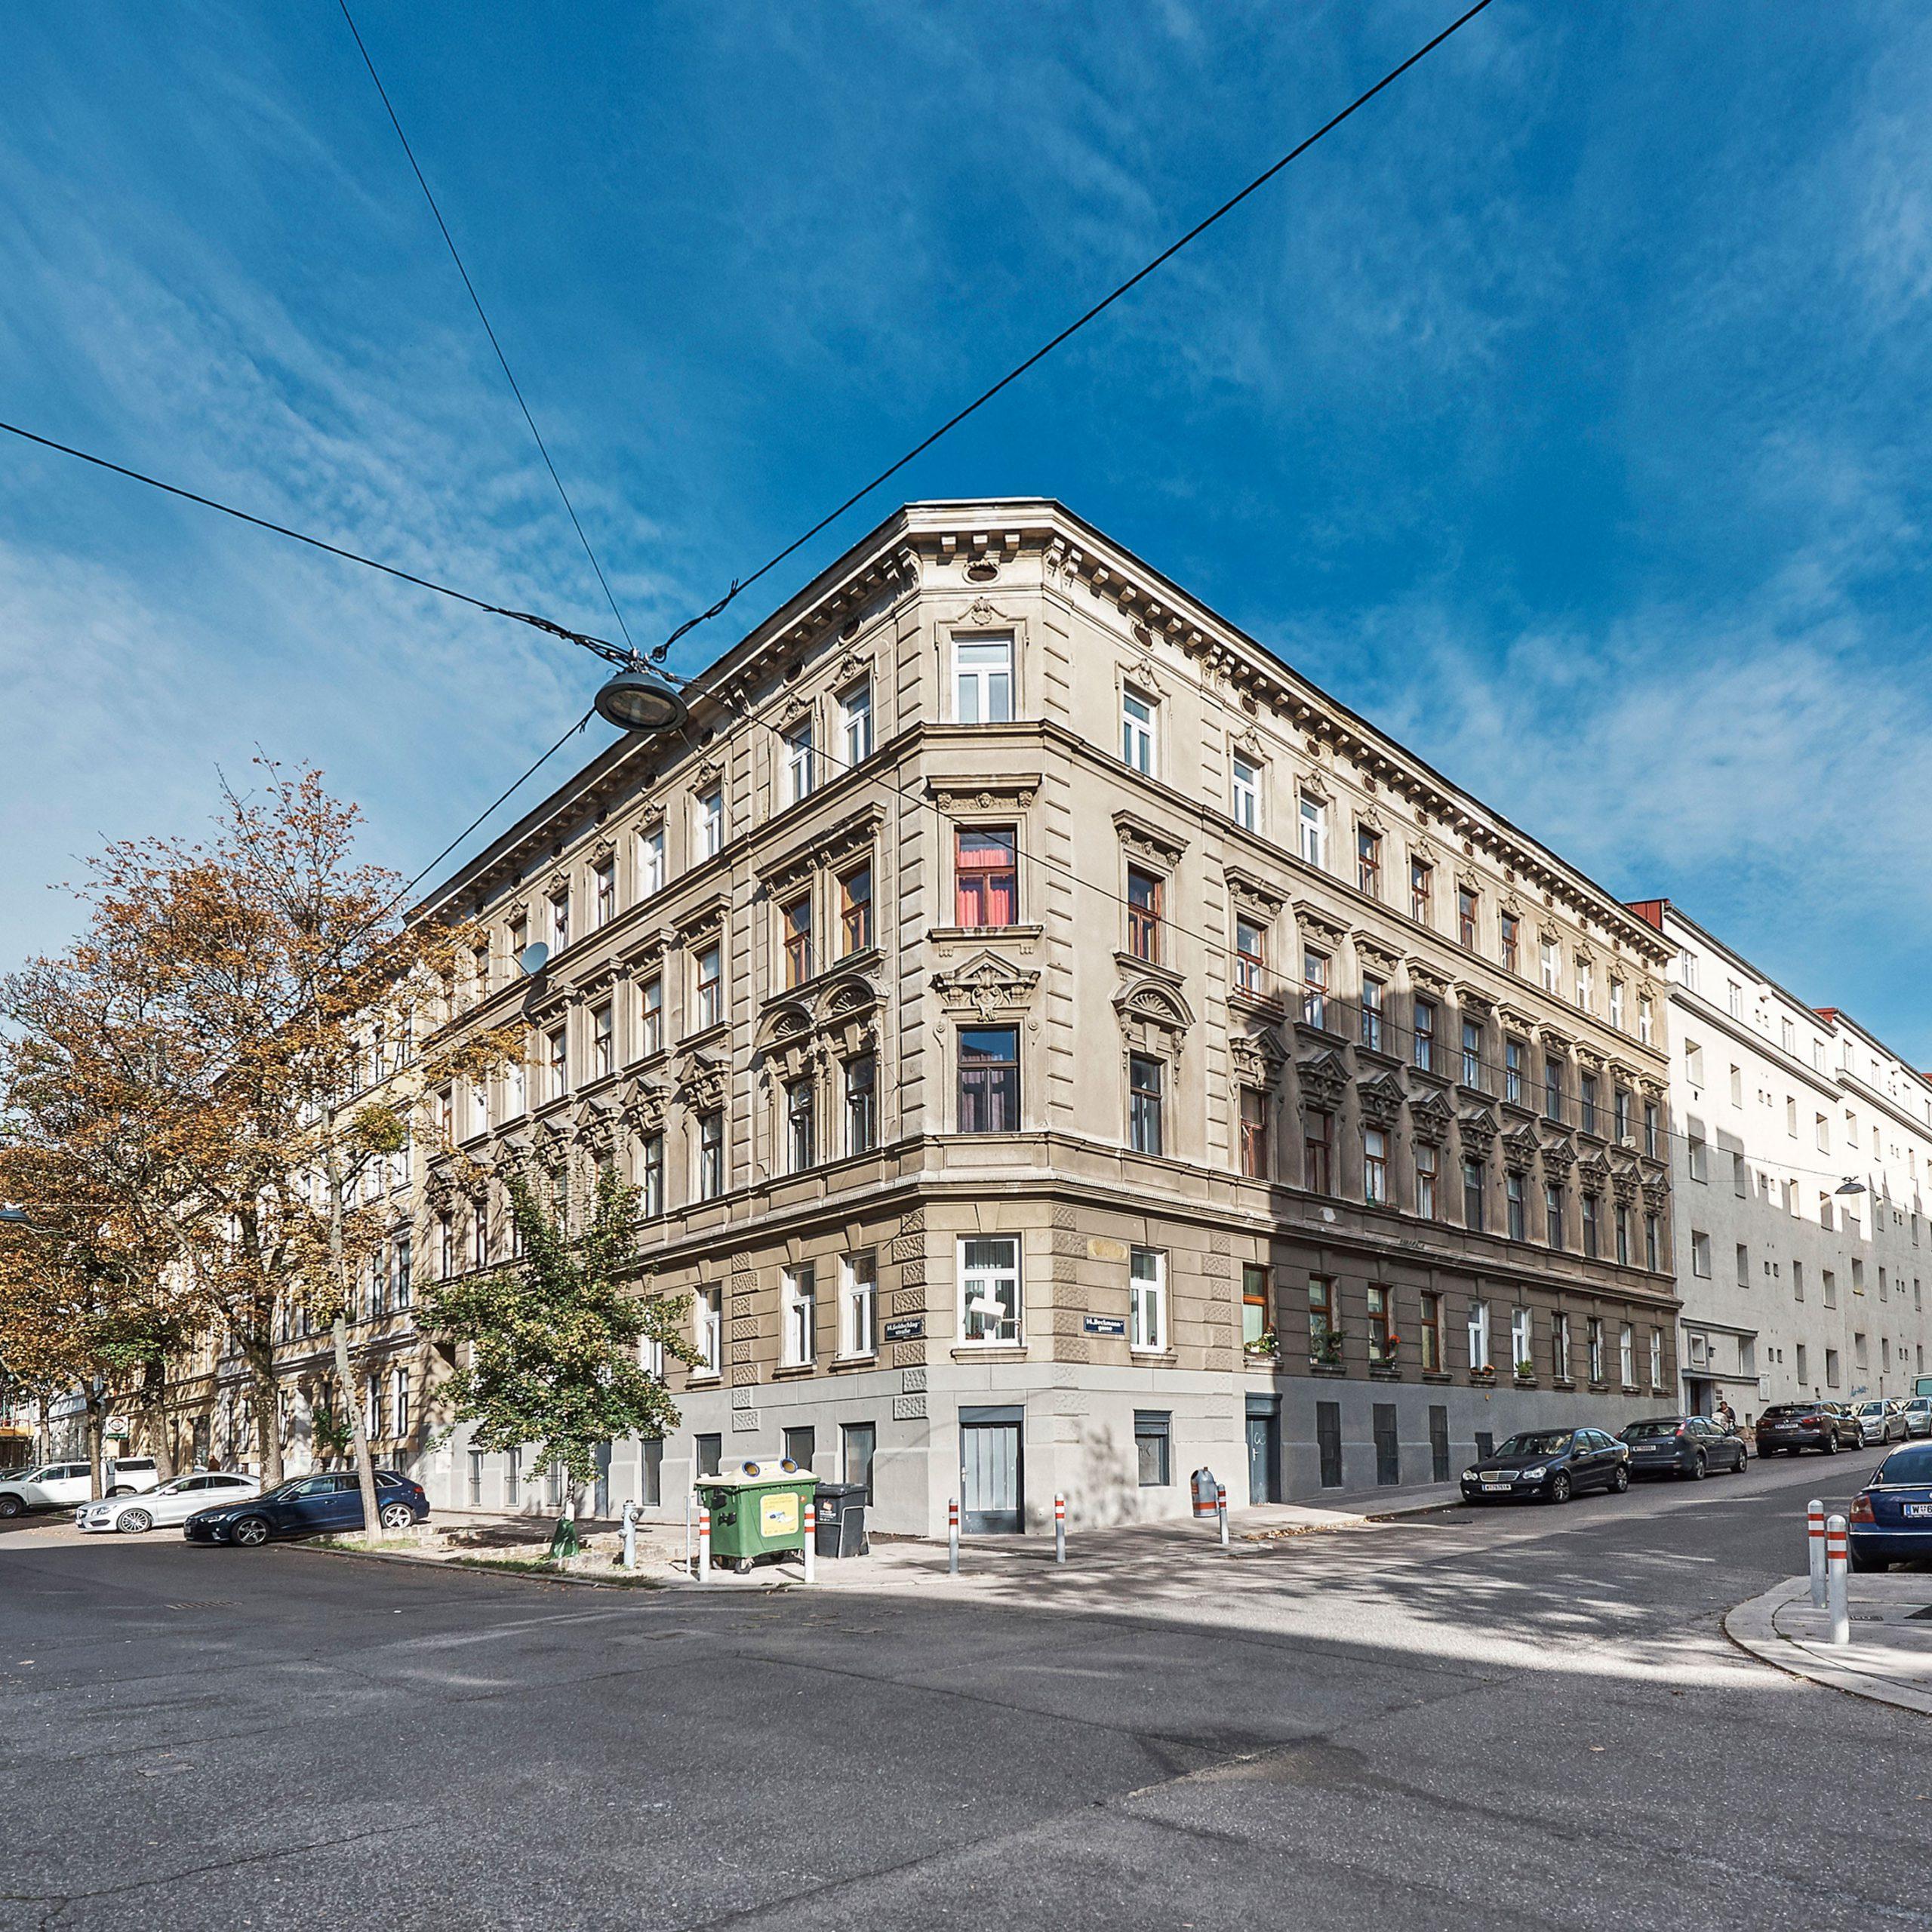 2020 1140 Goldschlagstraße